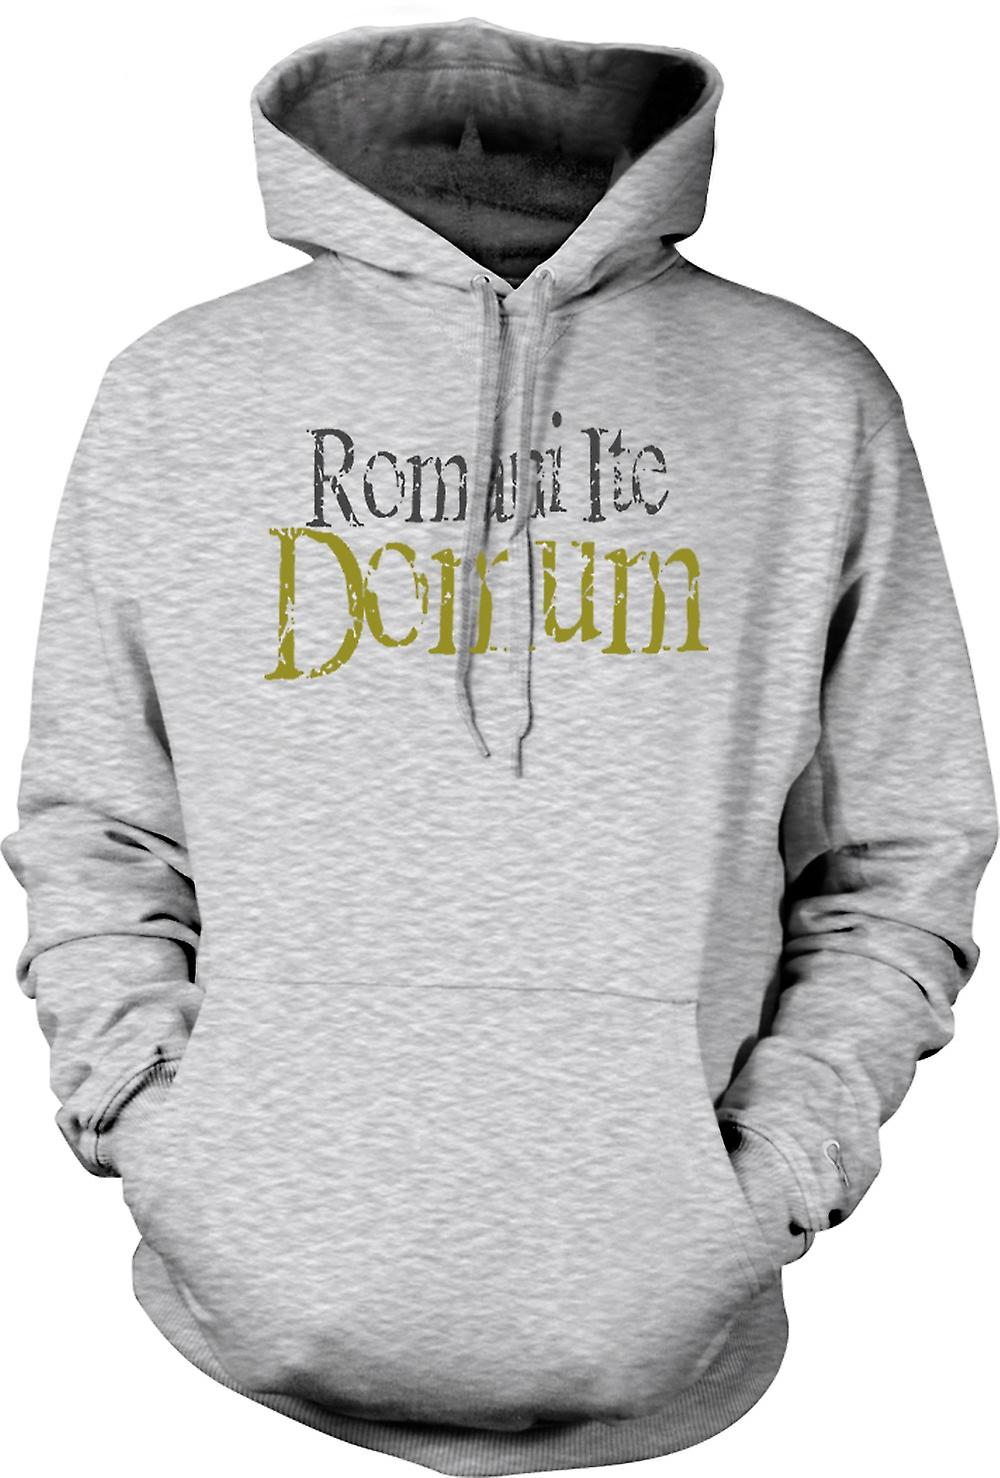 Mens Hoodie - Romani Ite Domum - Drôle